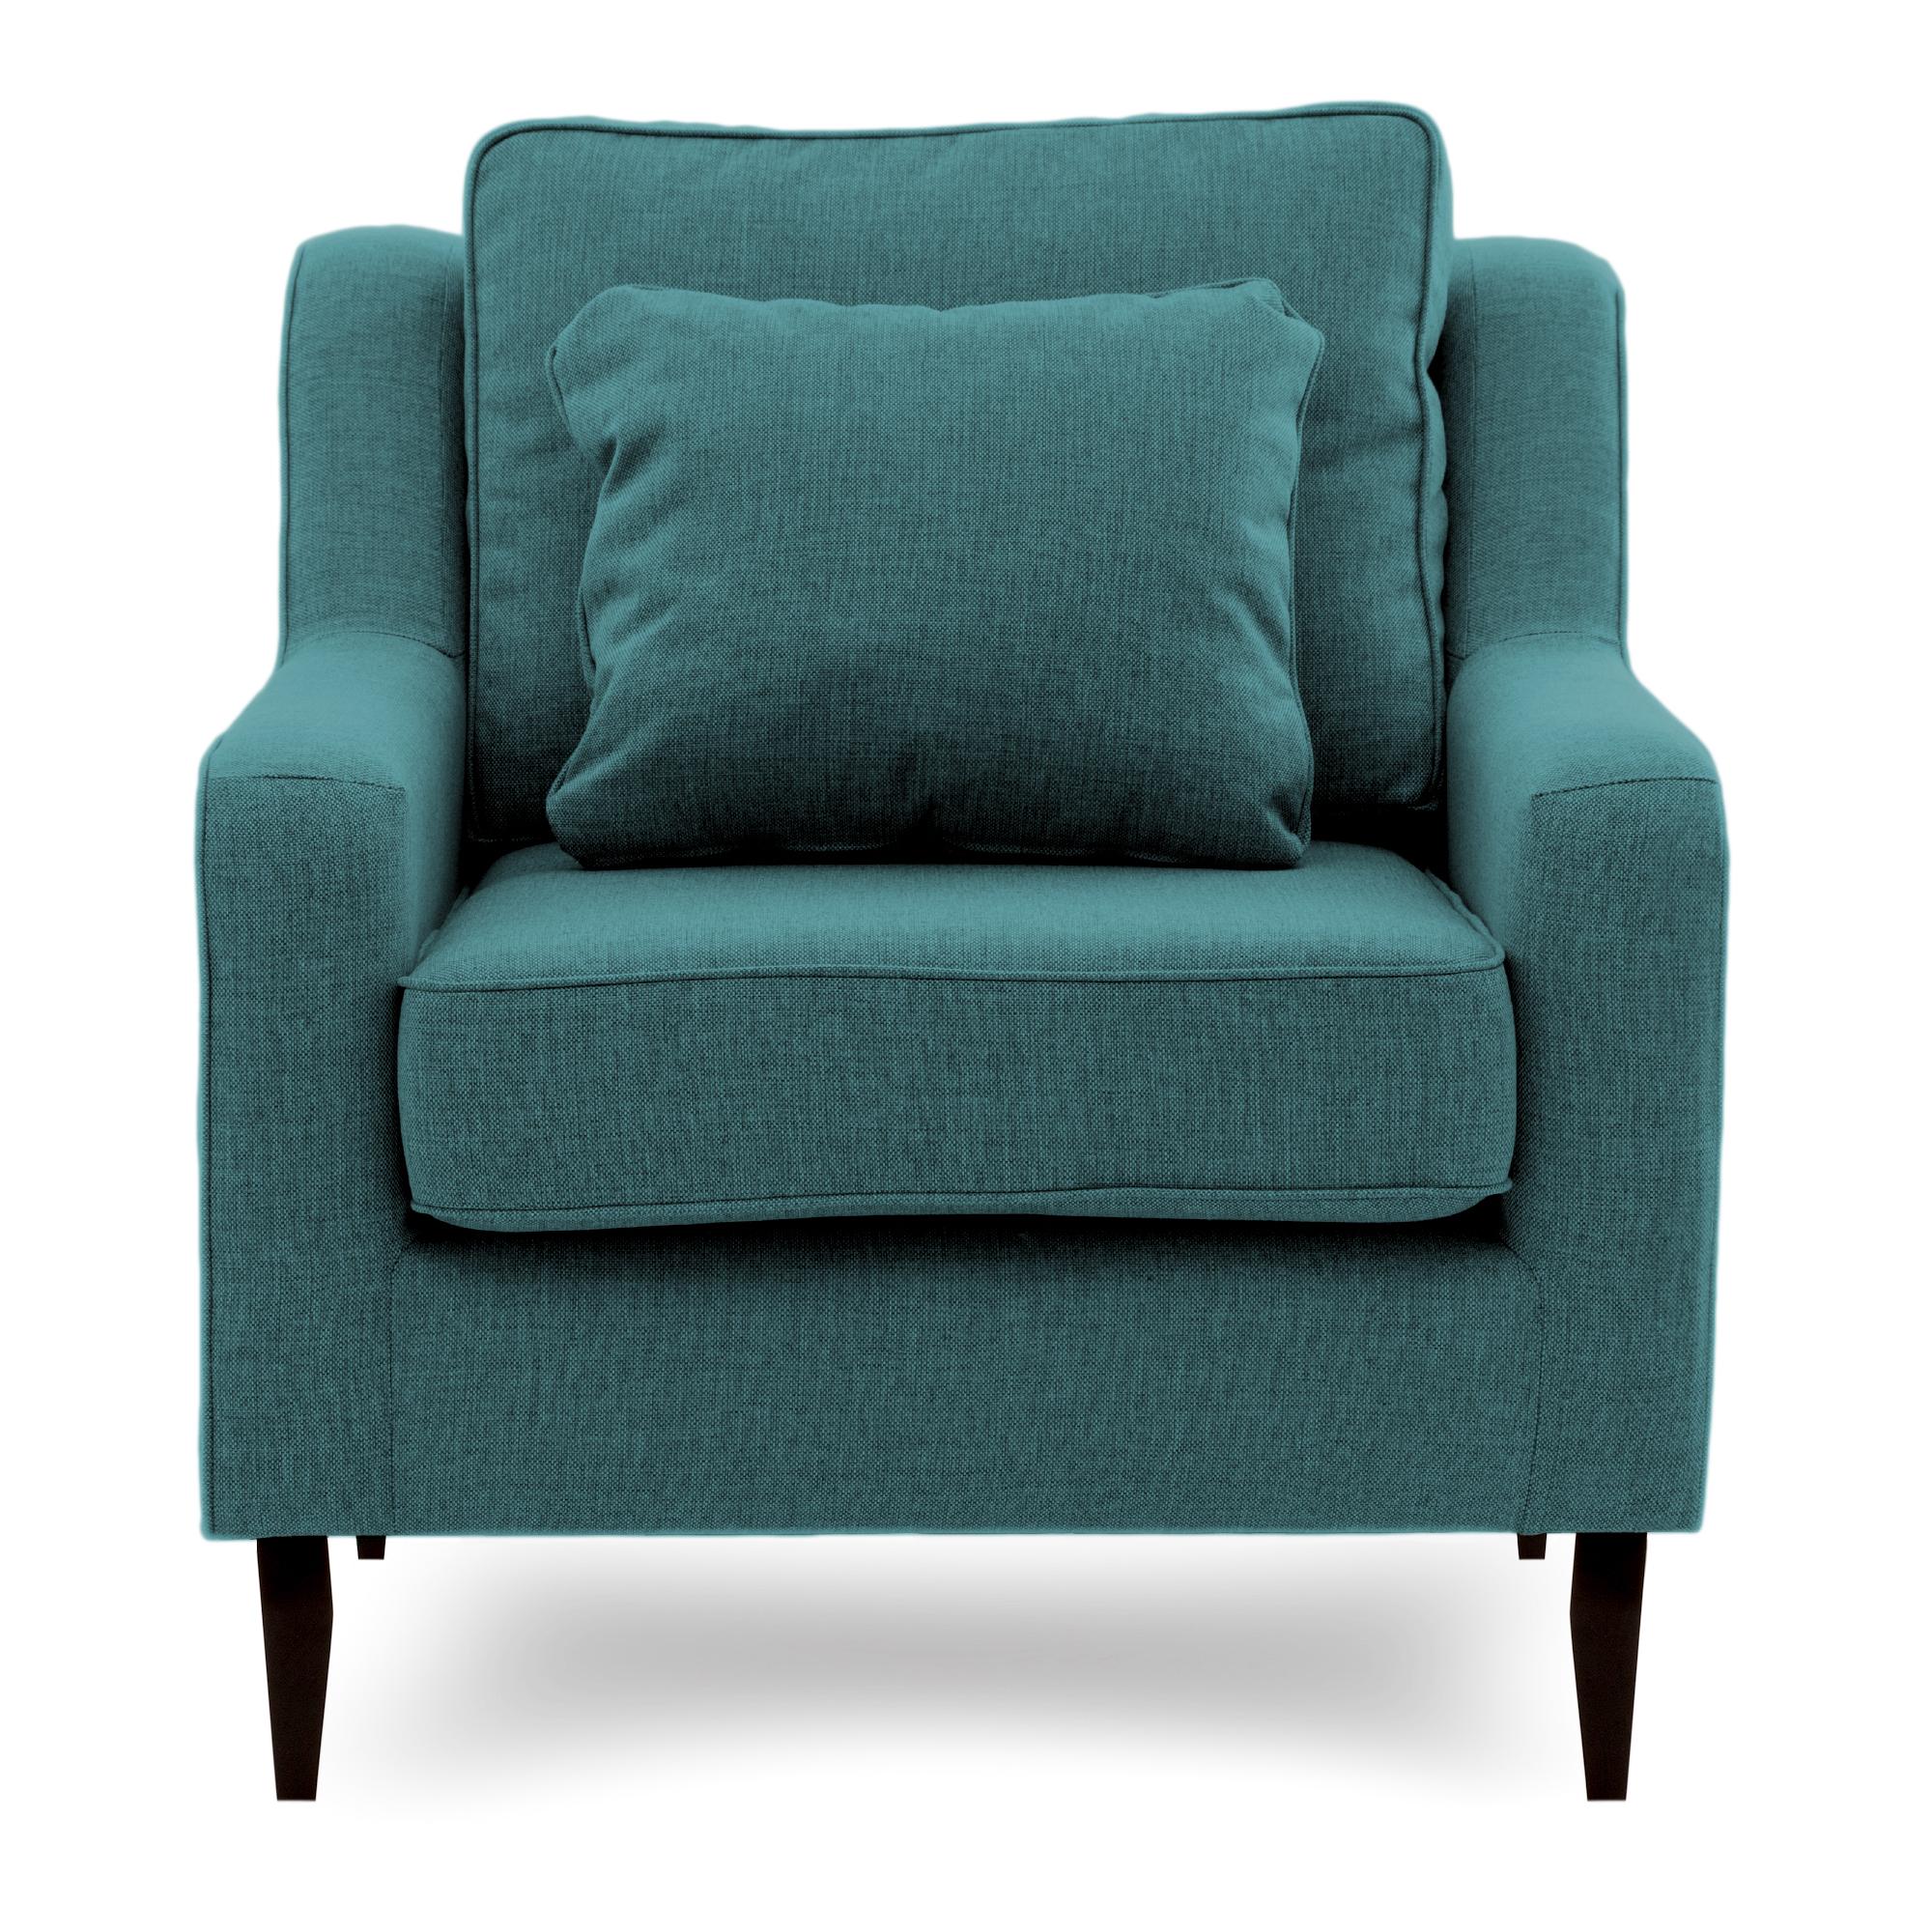 Fotoliu Bond Turquoise